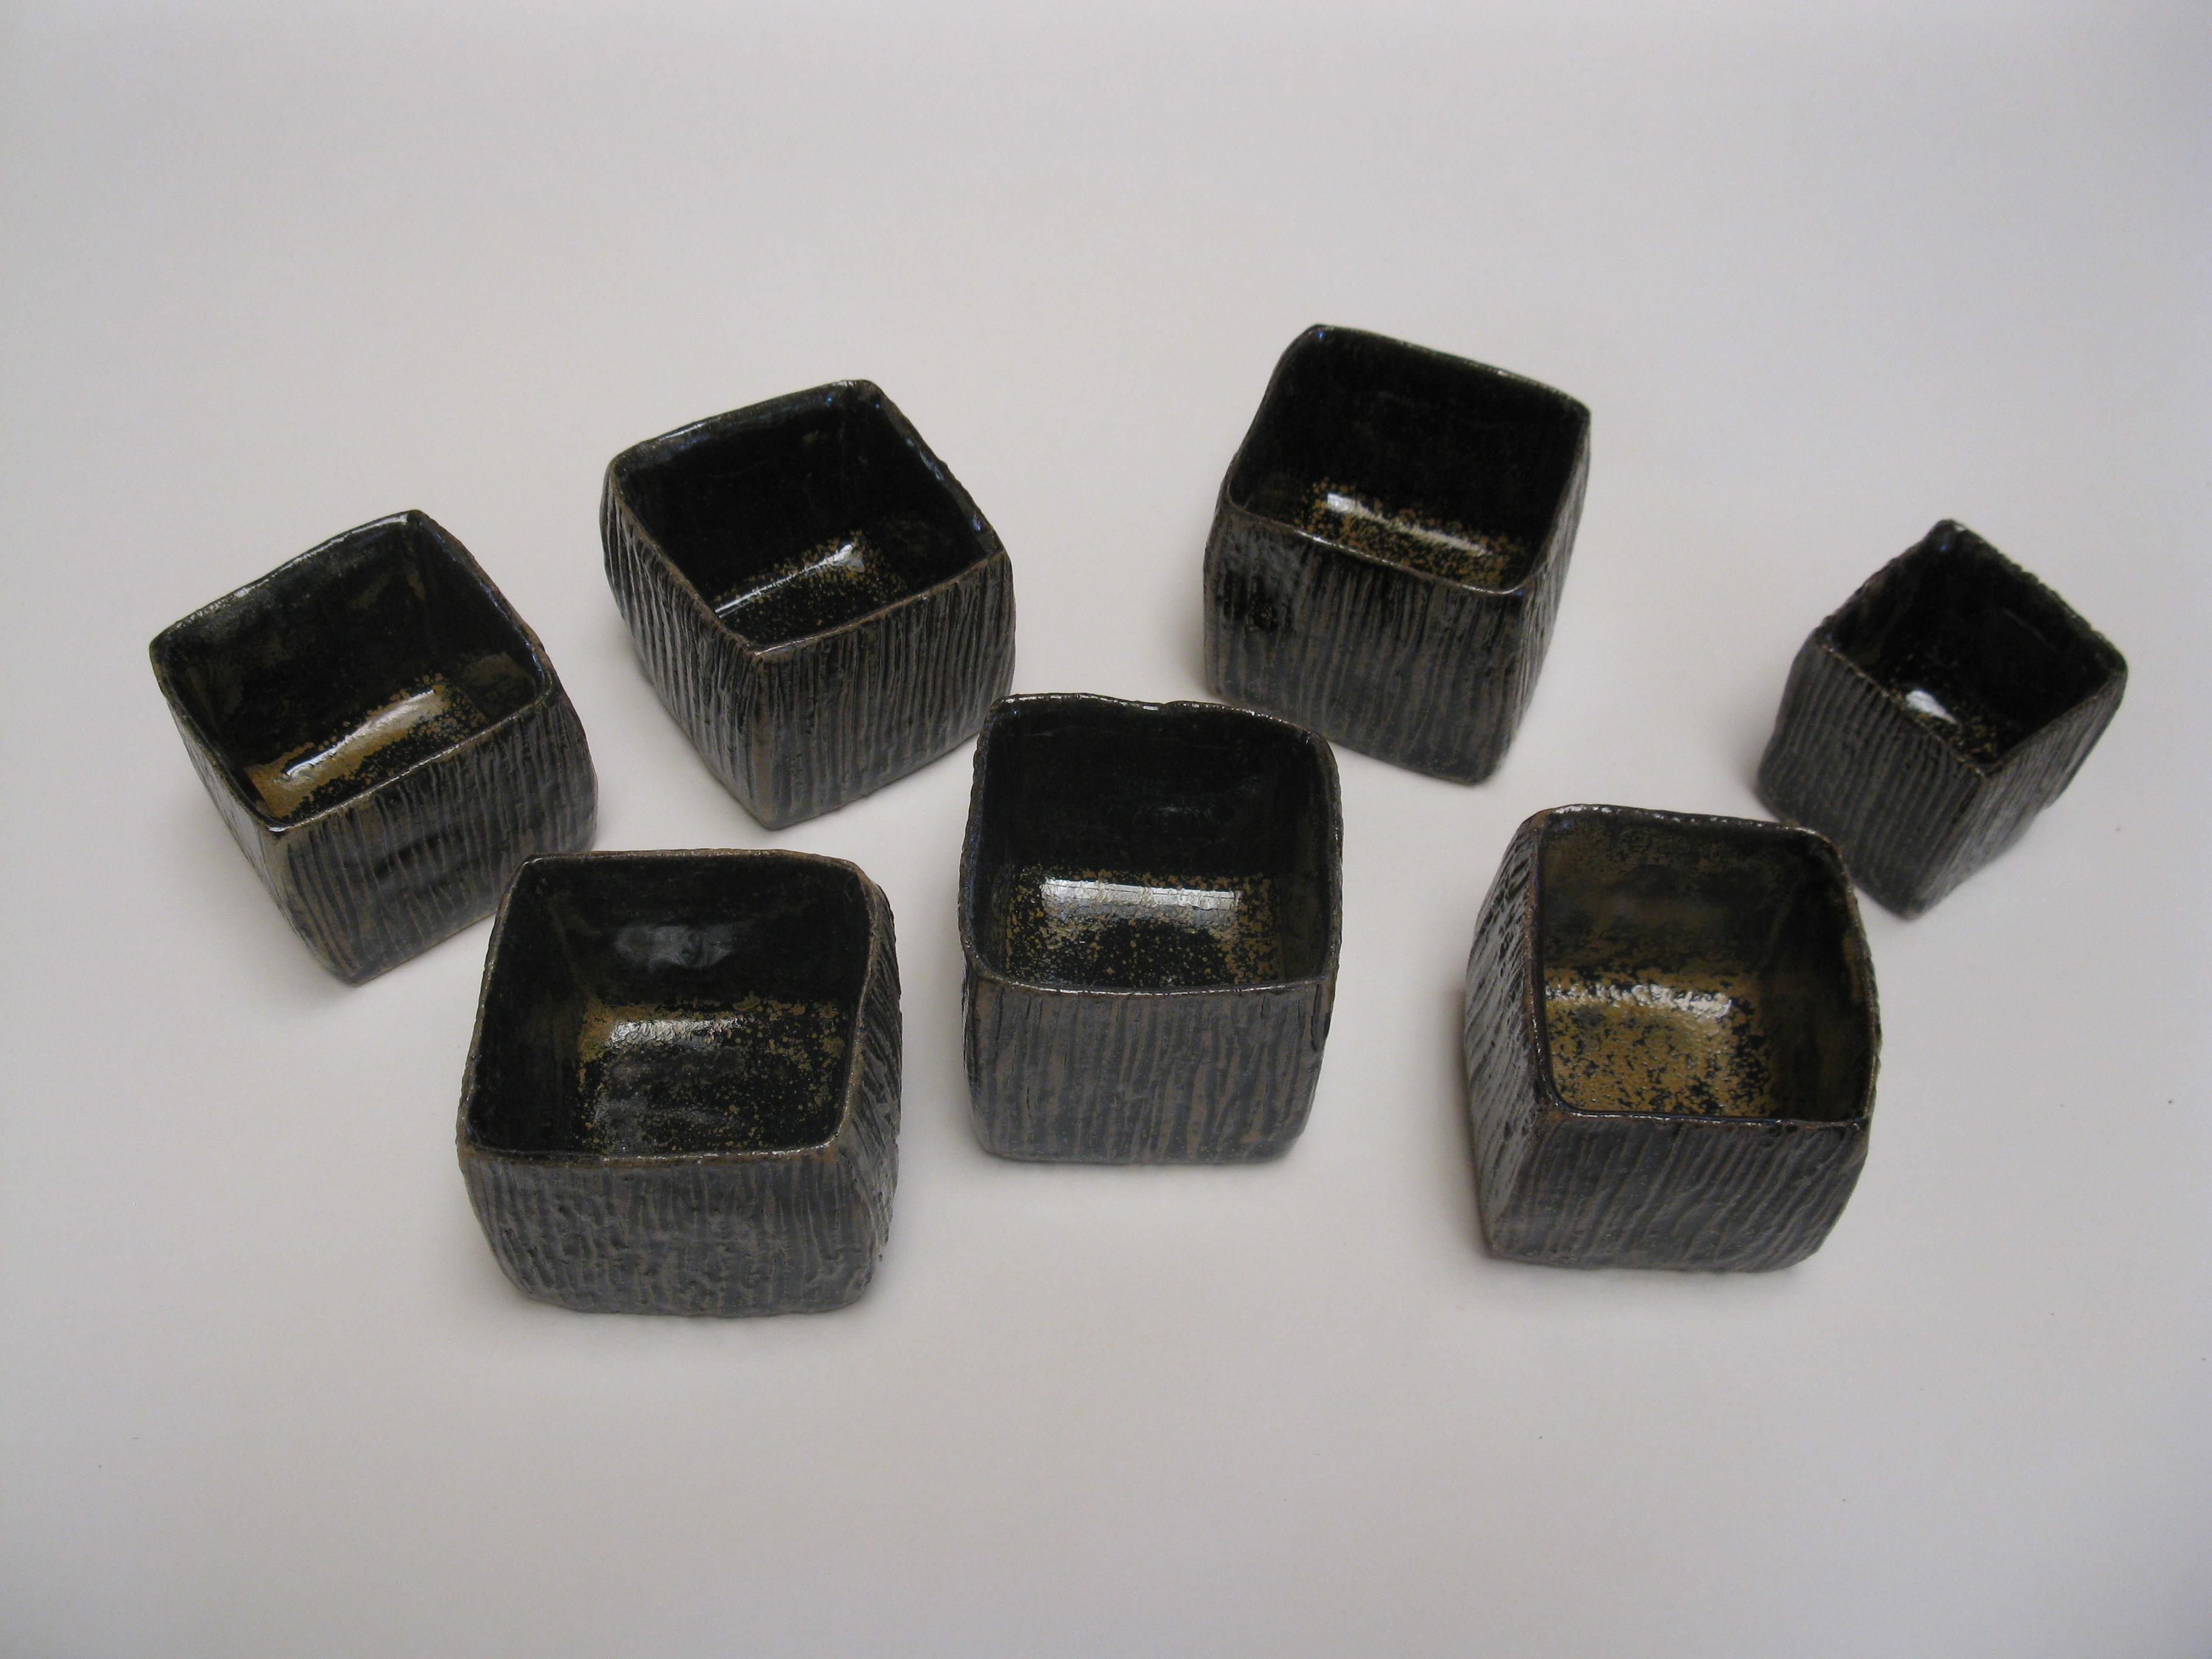 Tasses carrées (Cricri)